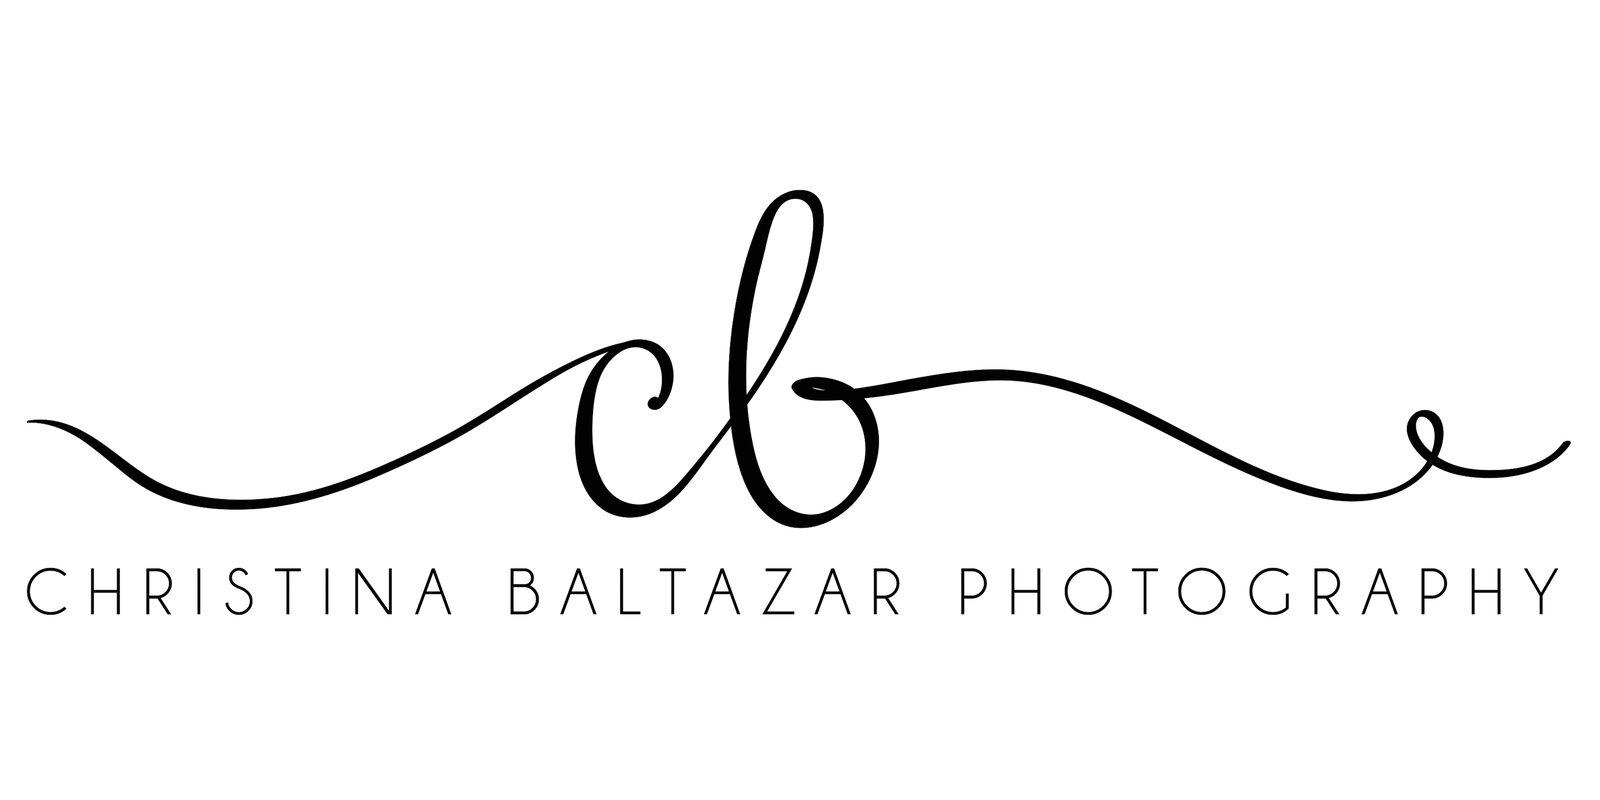 Christina Baltazar Photography